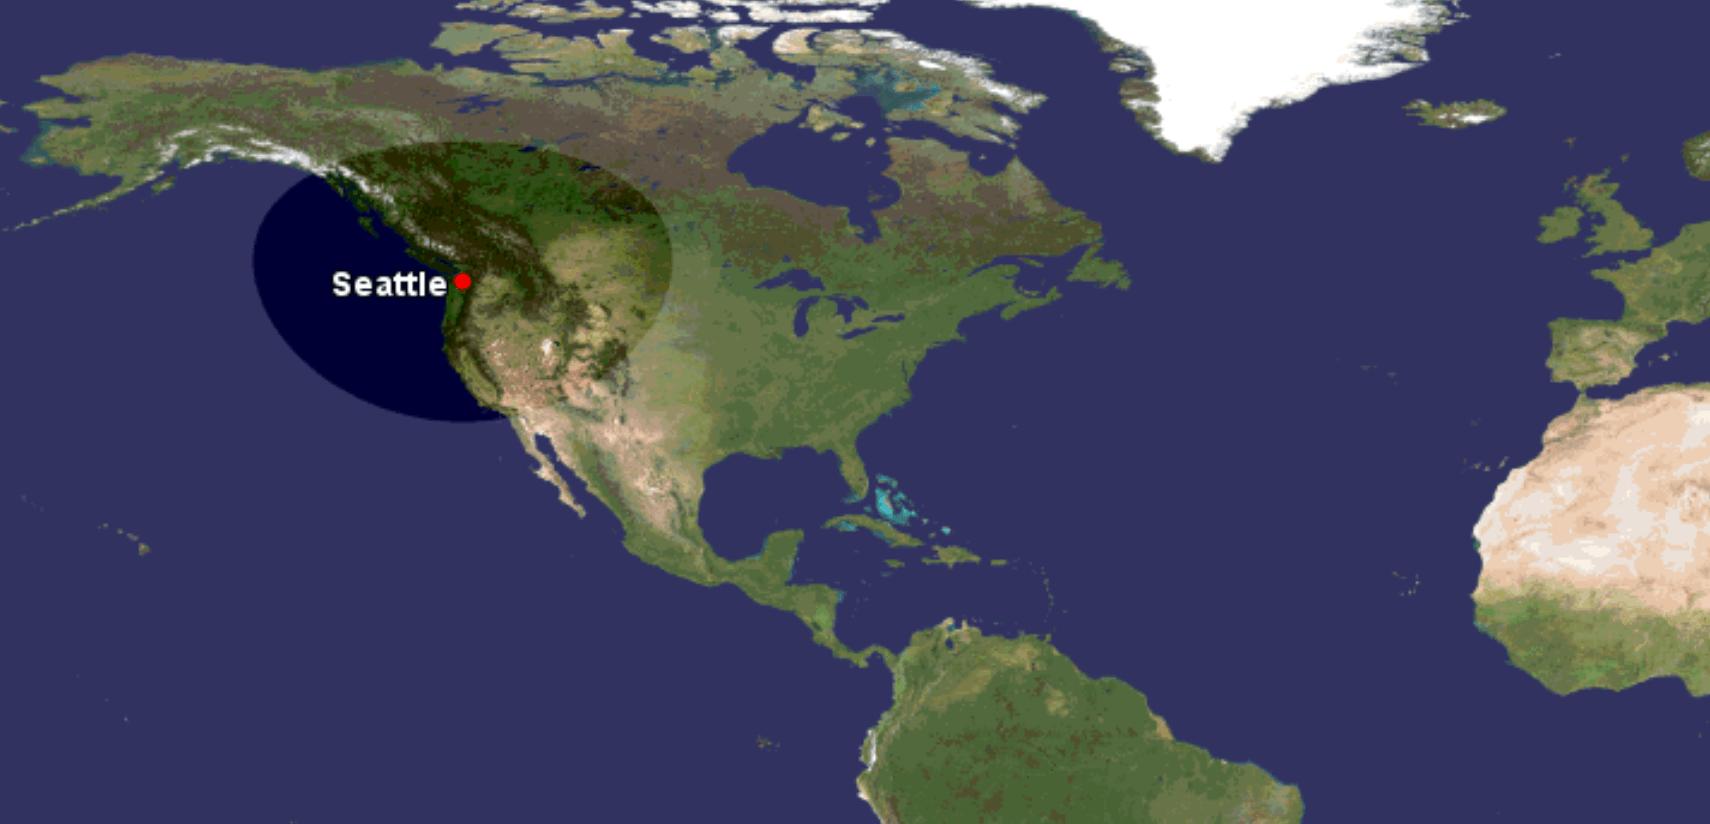 Commander 840 range from Seattle 875 nauticual miles